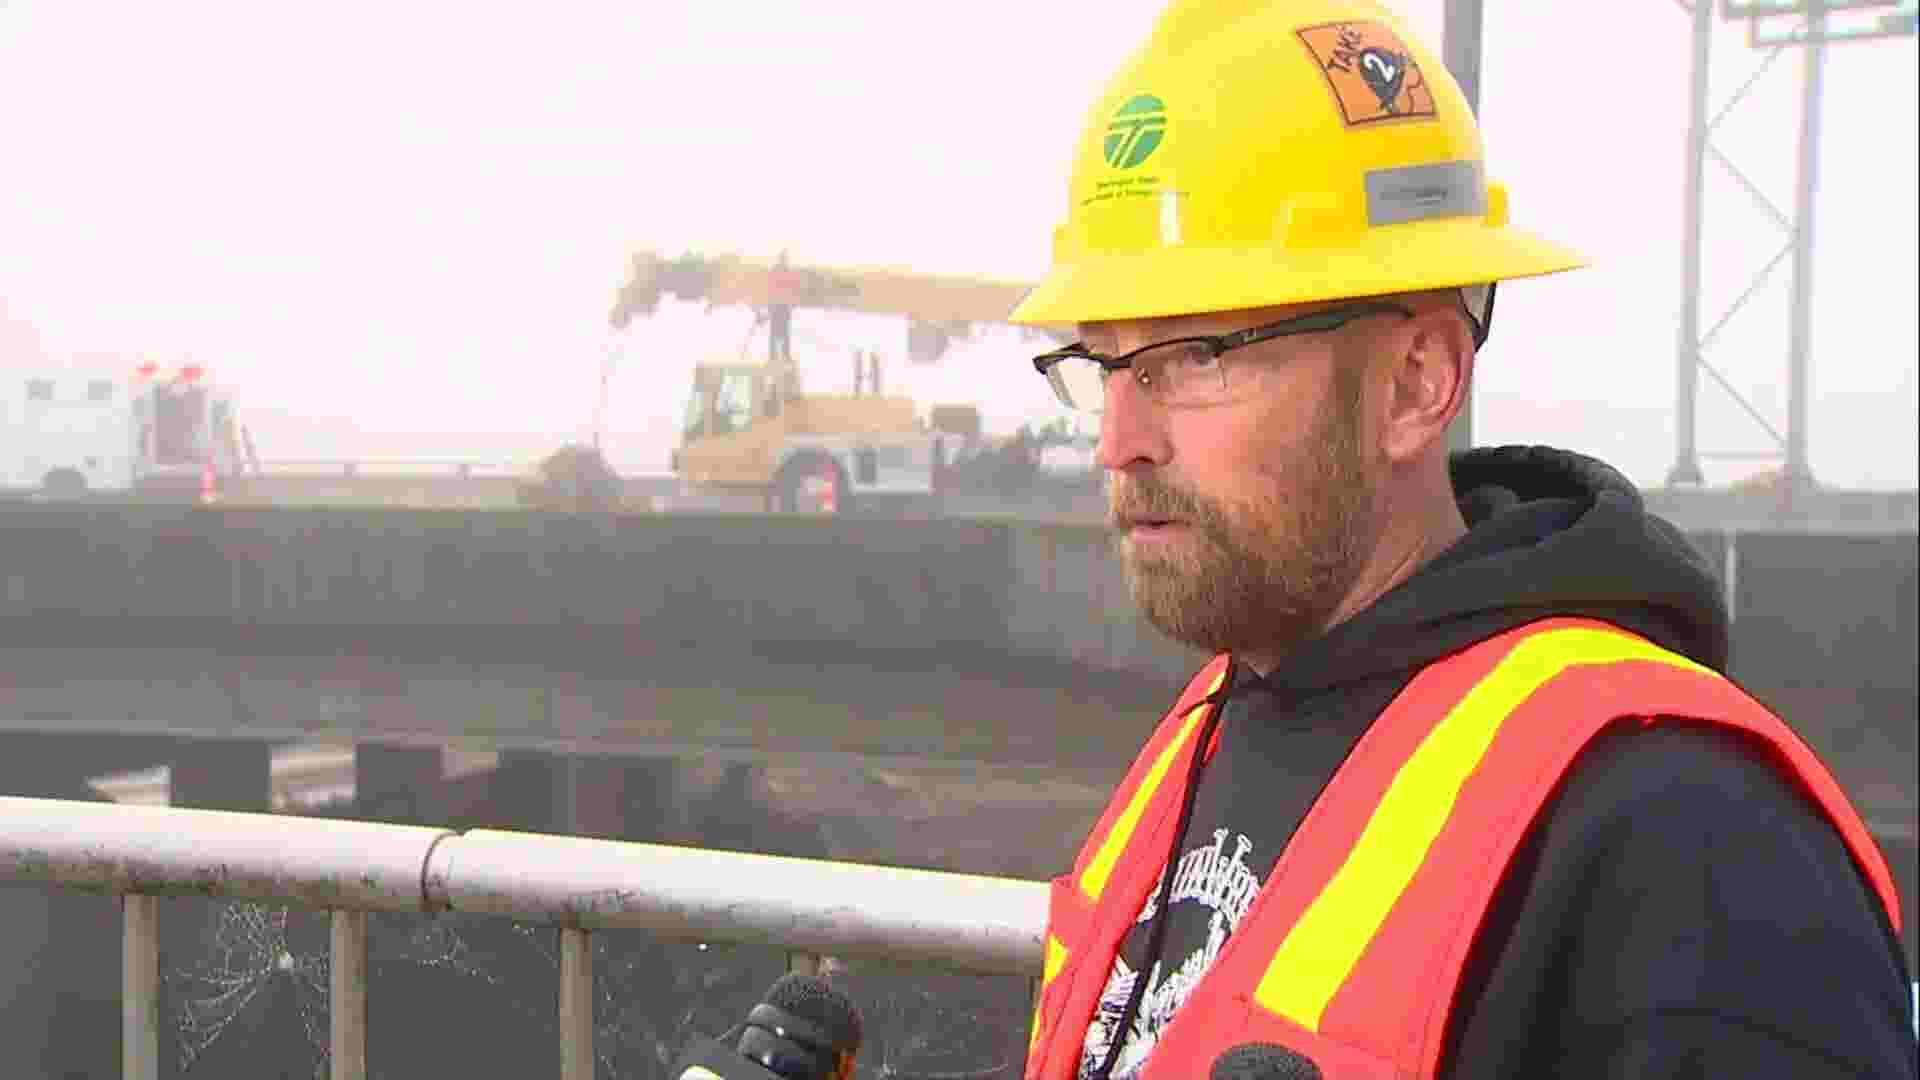 Crews clear logjam under Washington state bridge